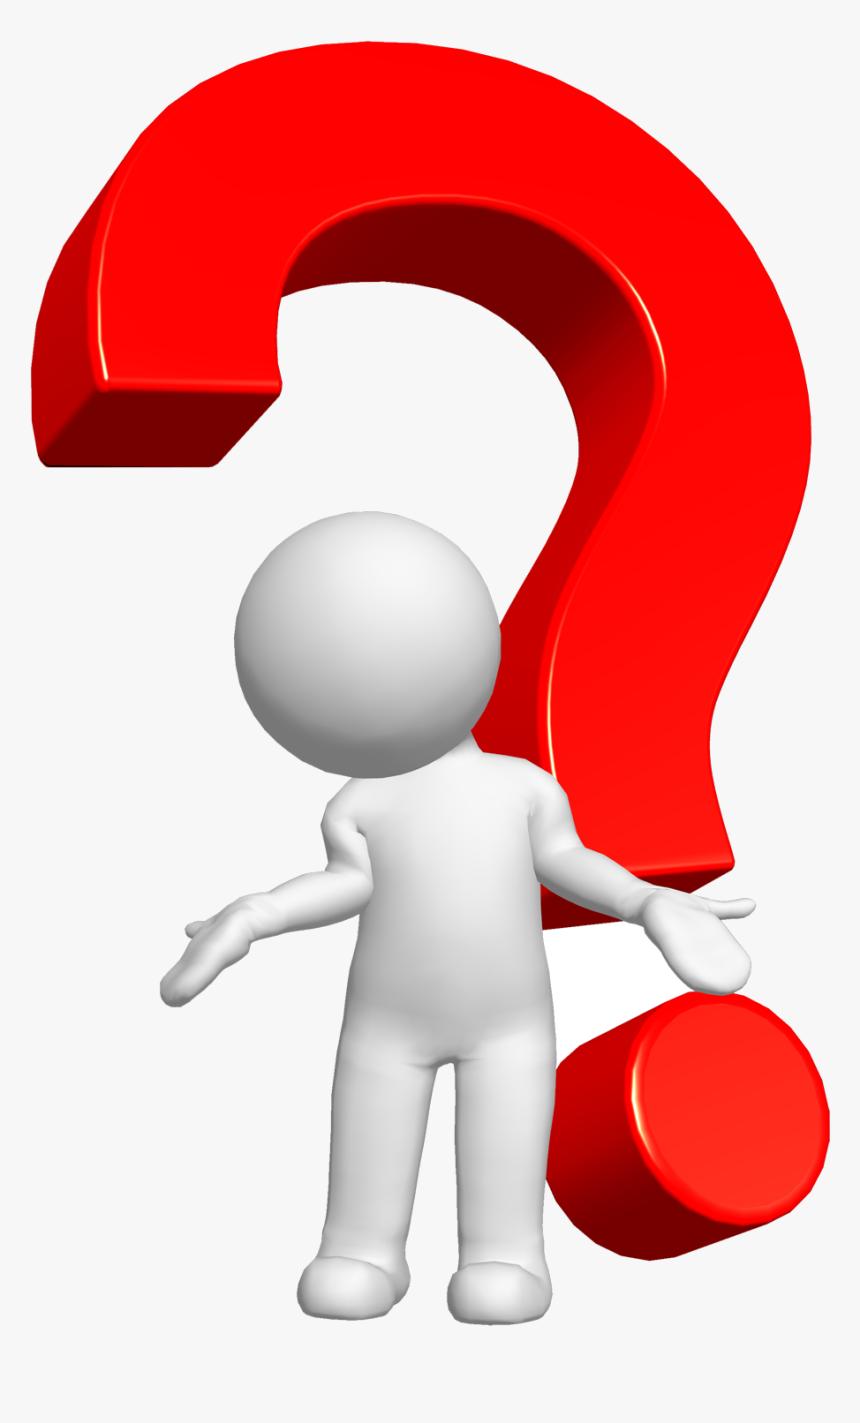 Question Mark Clip Art Free Clipart Images Image Transparent Question Mark Clipart Hd Png Download Kindpng